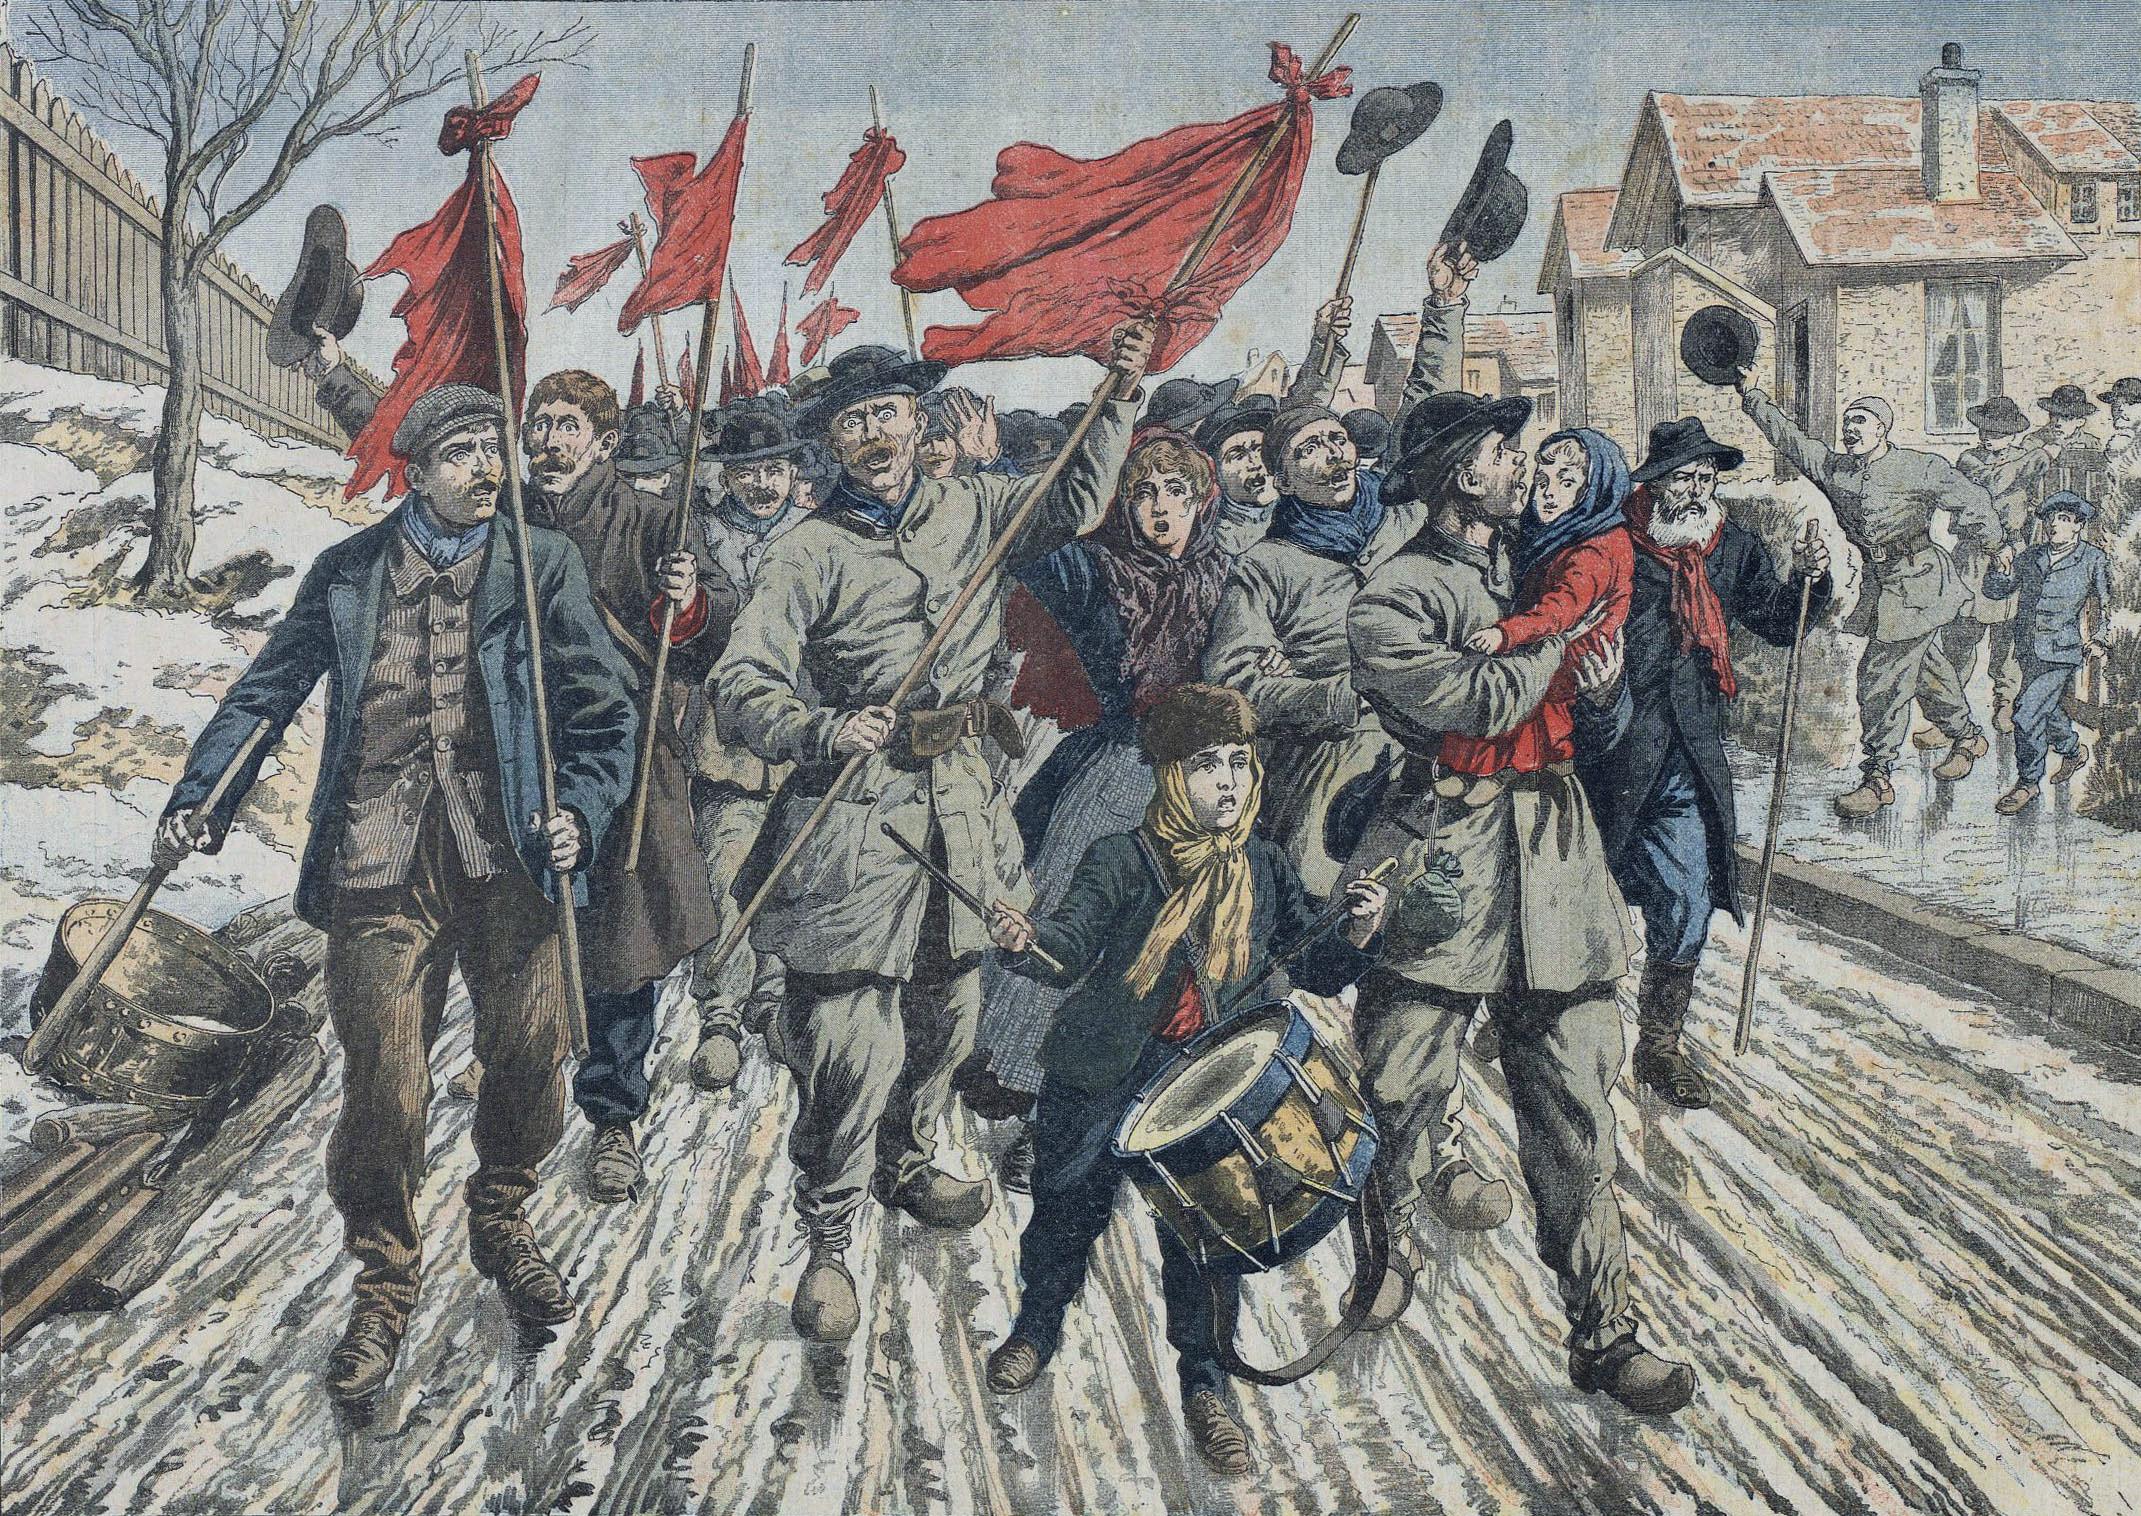 European Socialism - Undergraduate Lecture or Seminar